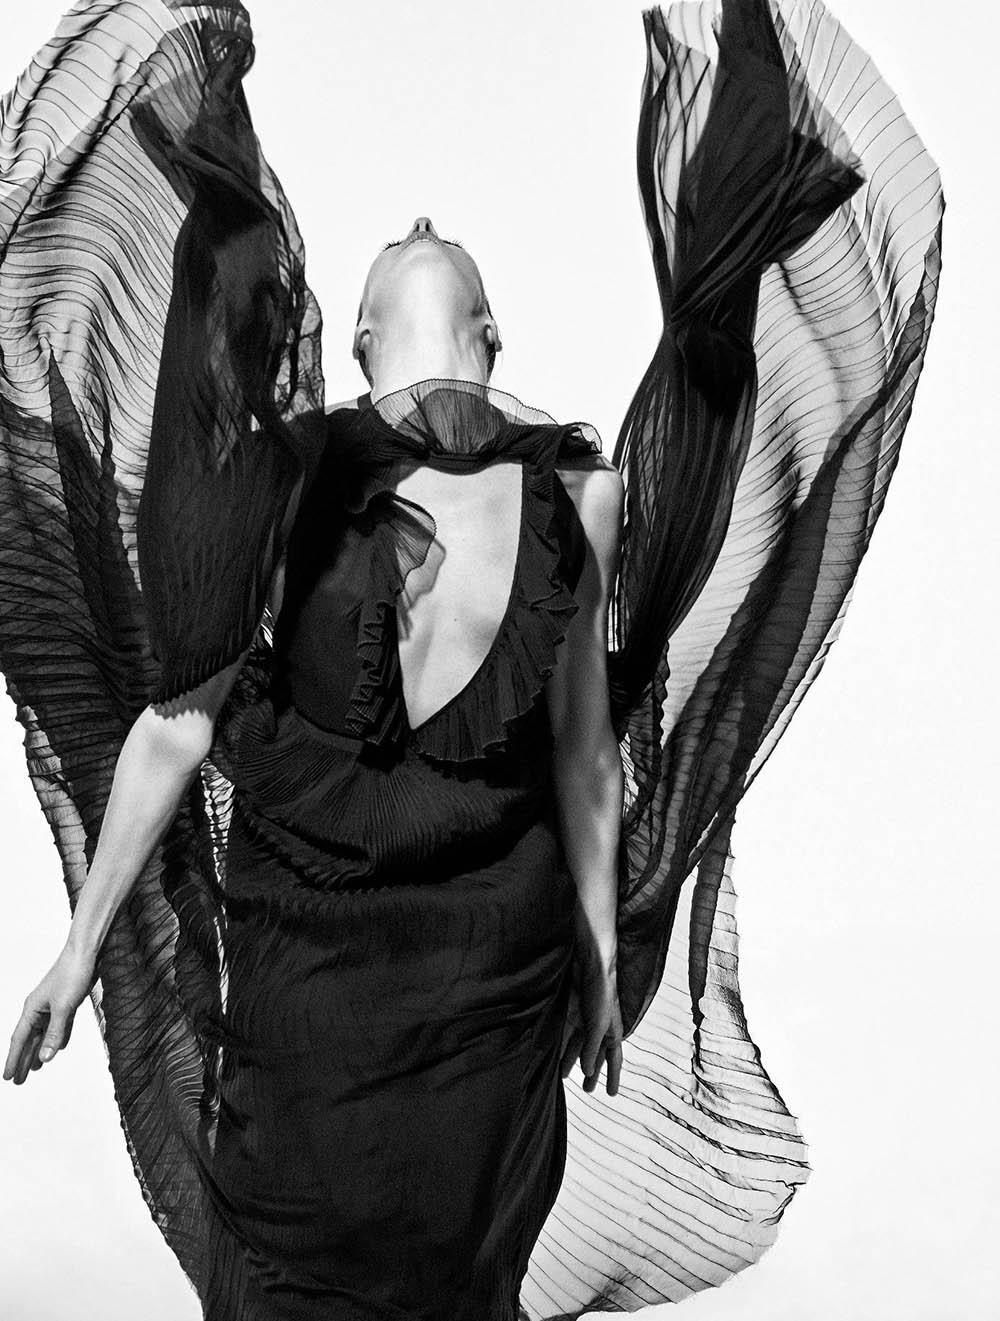 Marie-Agnès Gillot covers Numéro May 2018 by Koto Bolofo